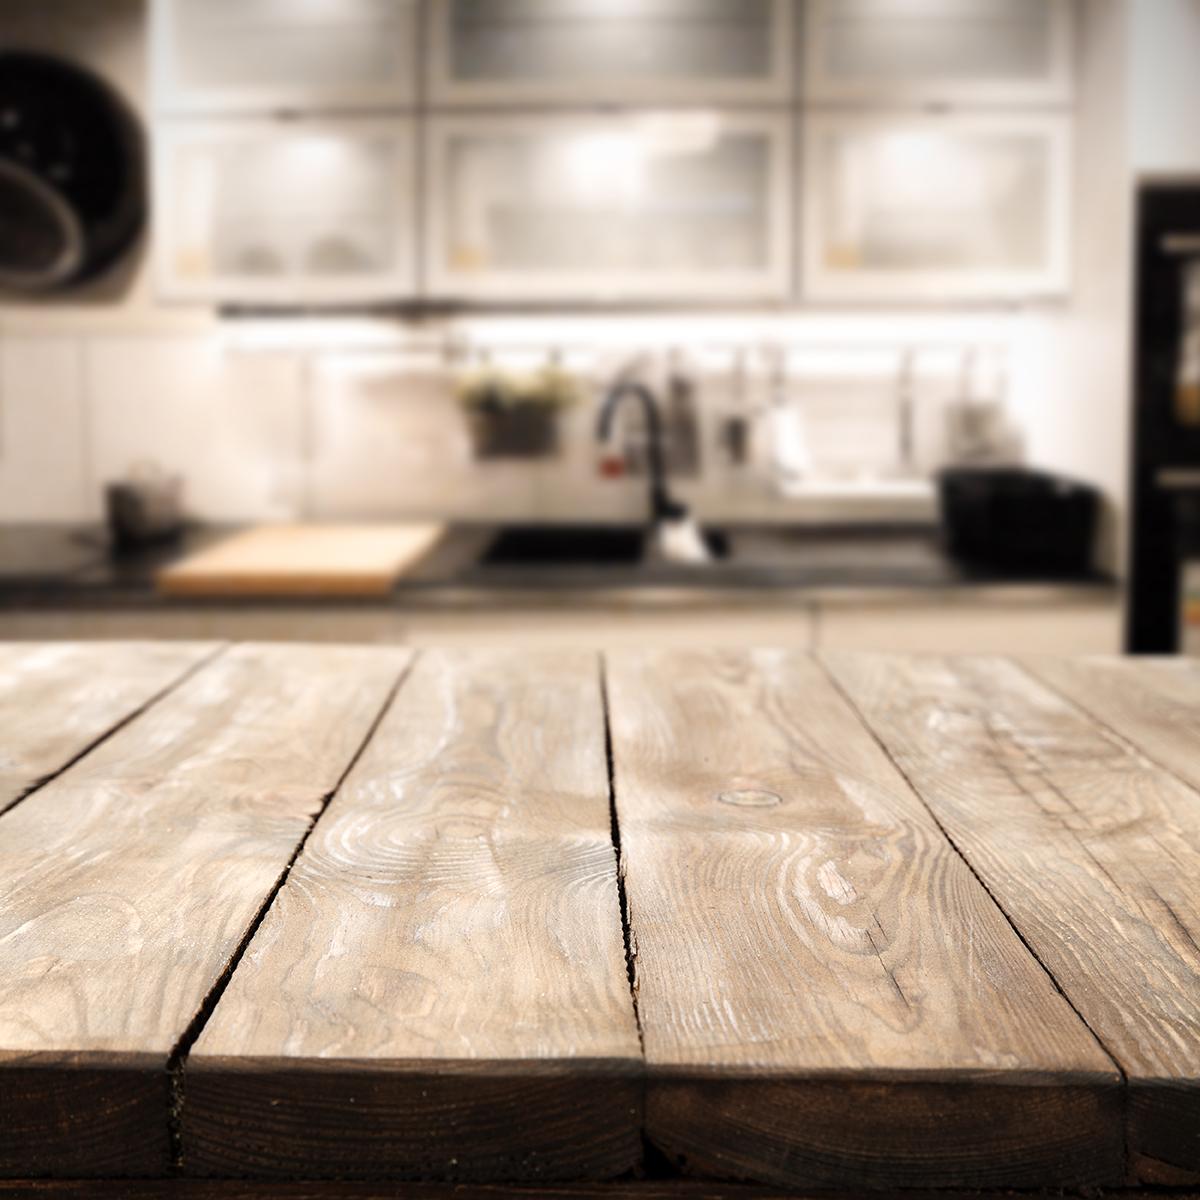 Rustic Kitchen Installations